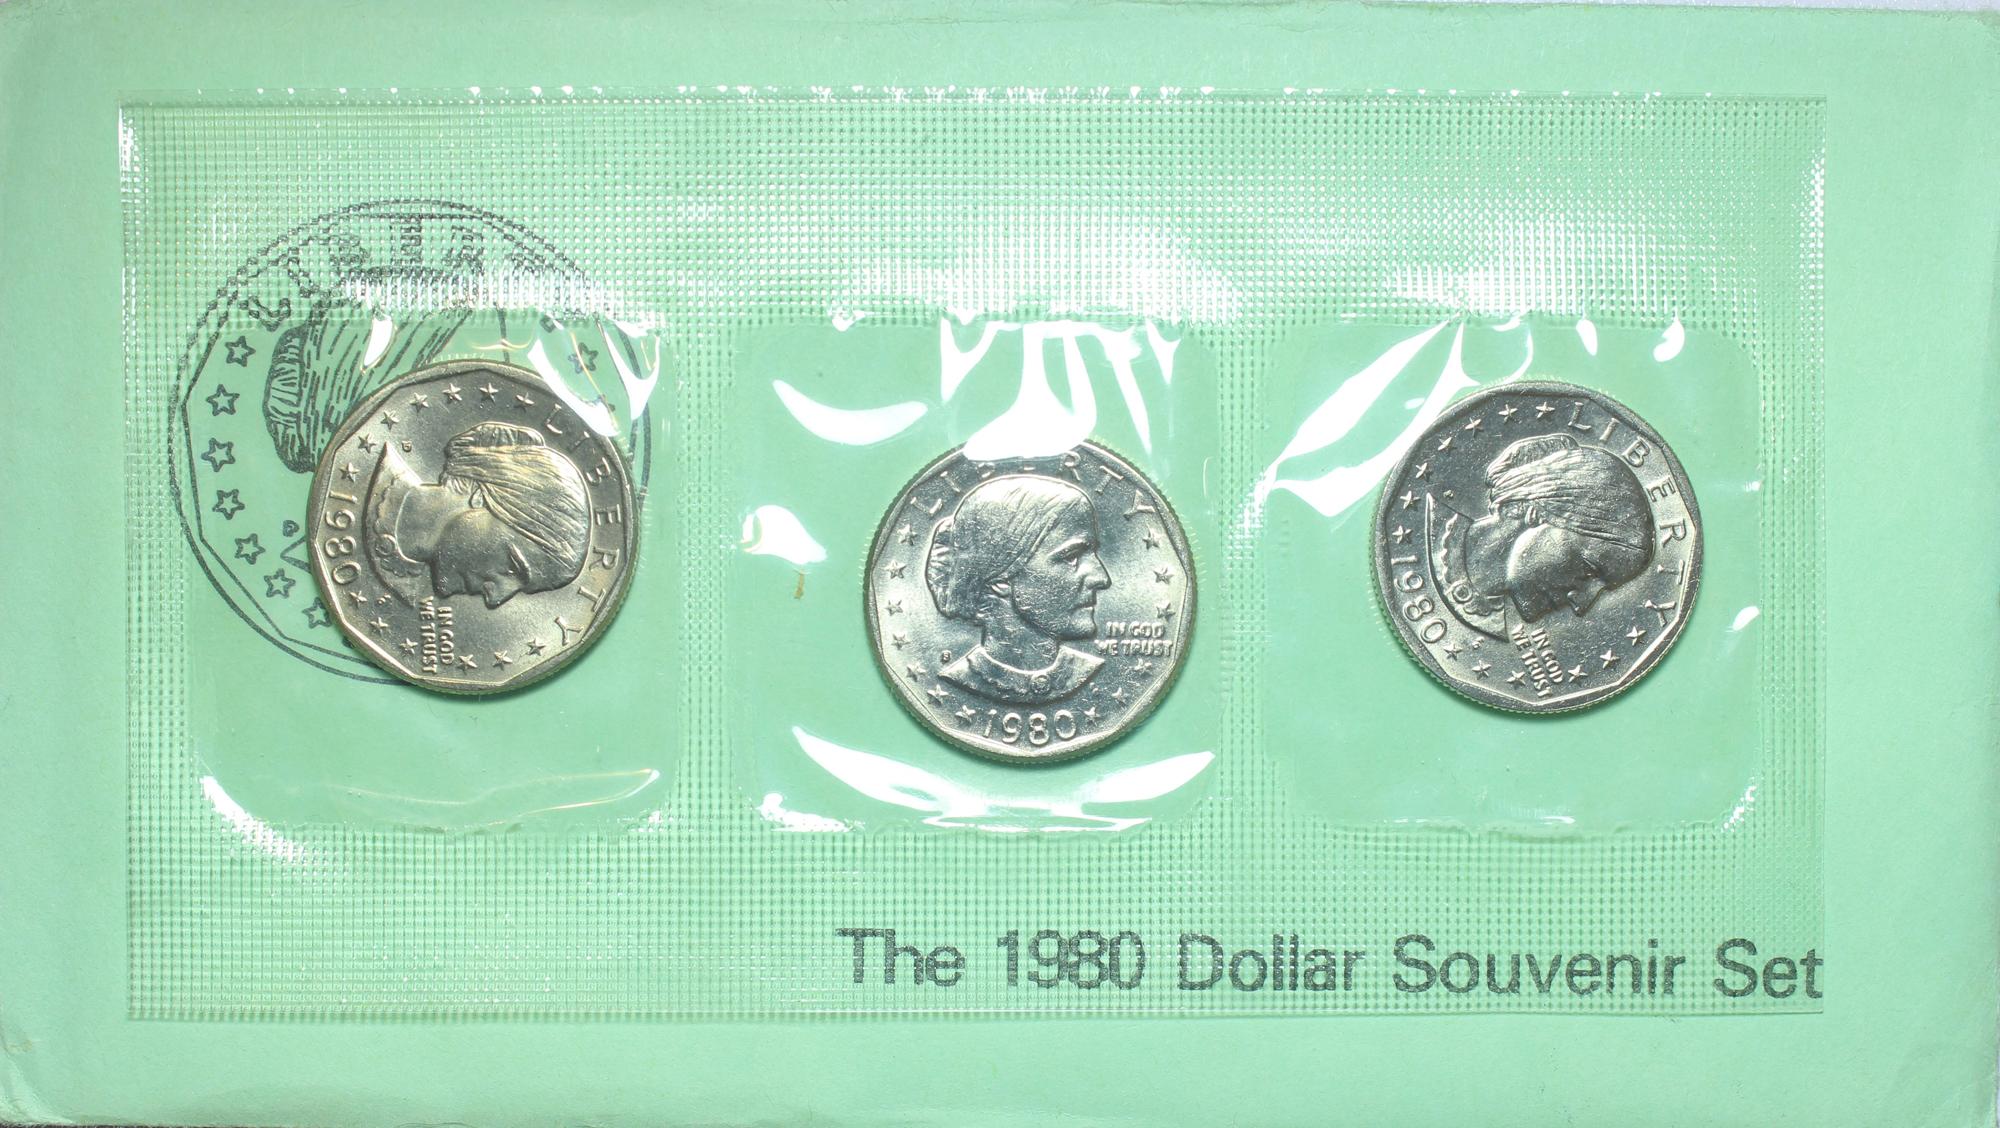 1980 Susan B Anthony Dollar Souvenir Set Coin Help